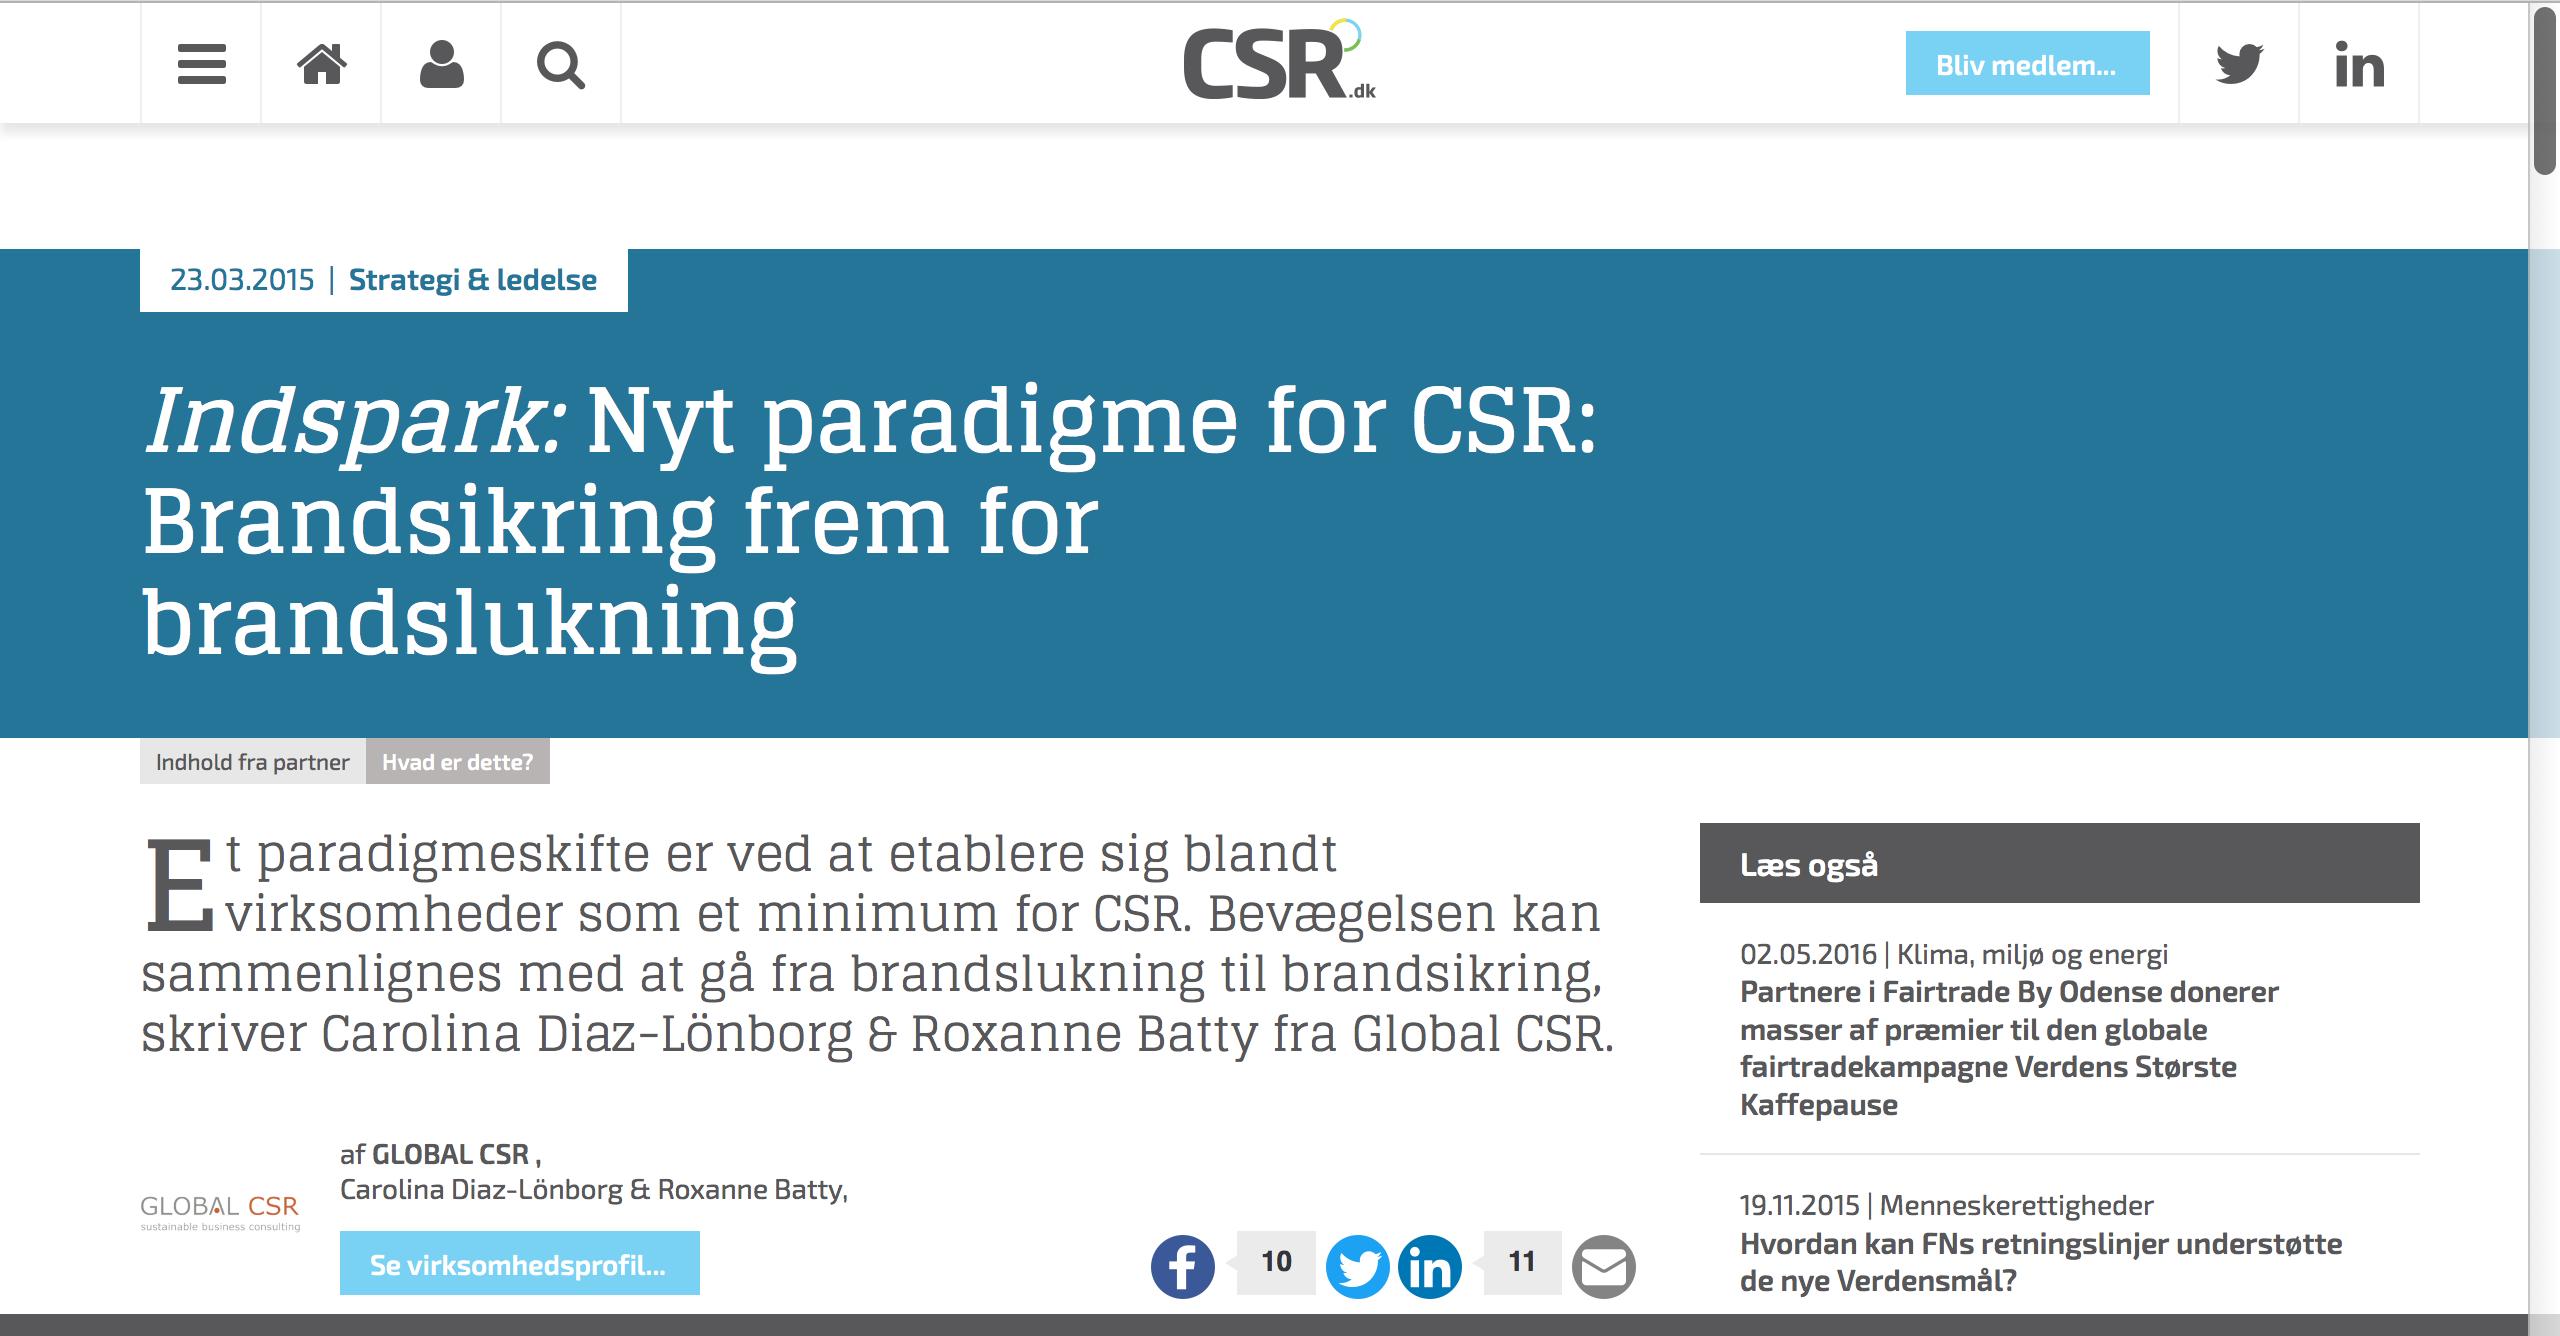 Blog: Nyt Paradigme for CSR. CSR.dk